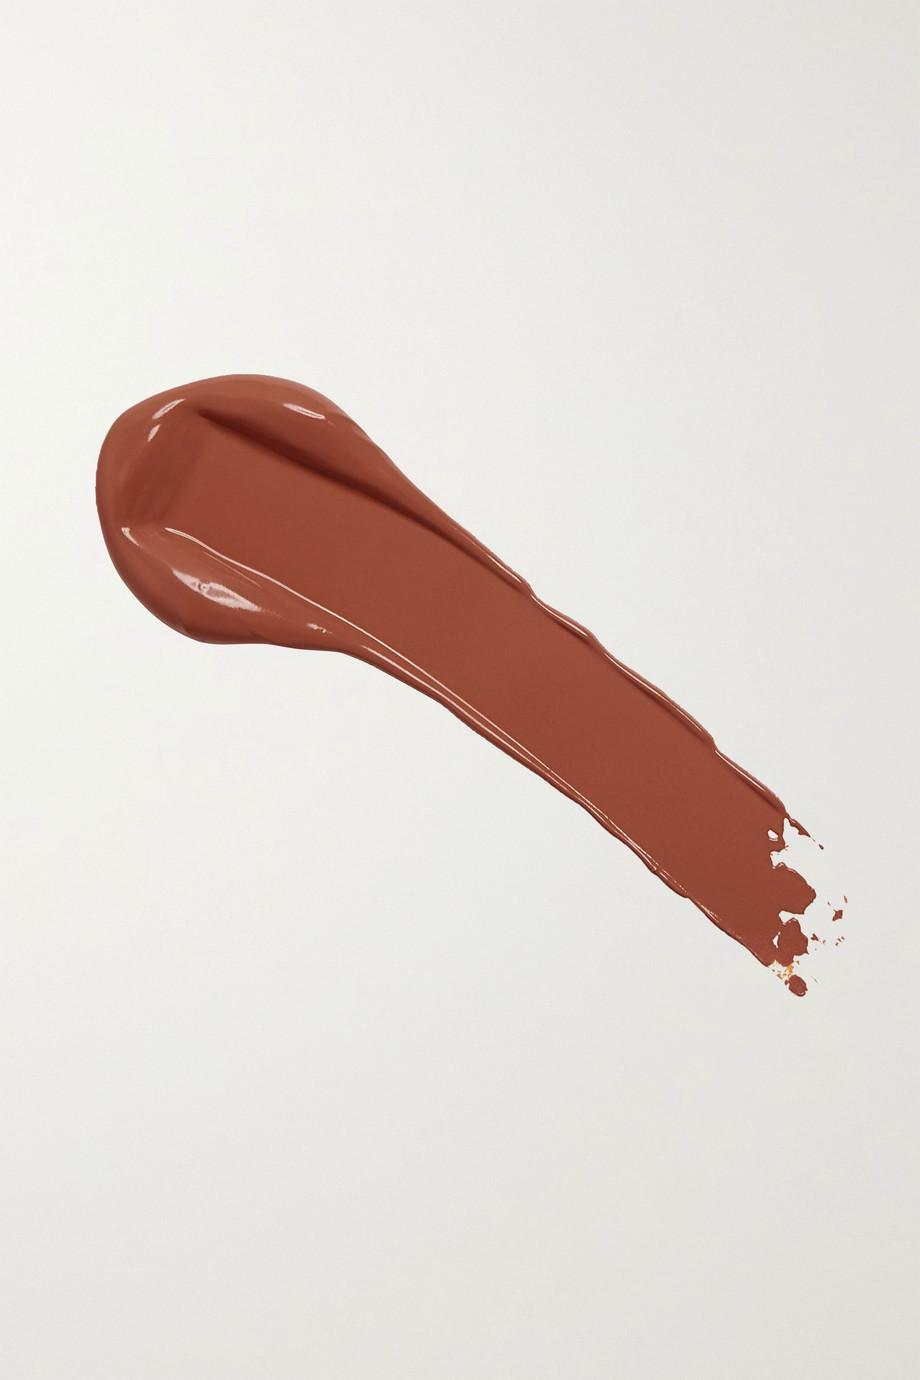 Huda Beauty FauxFilter Luminous Matte Liquid Foundation - Coffee Bean 530R, 35ml